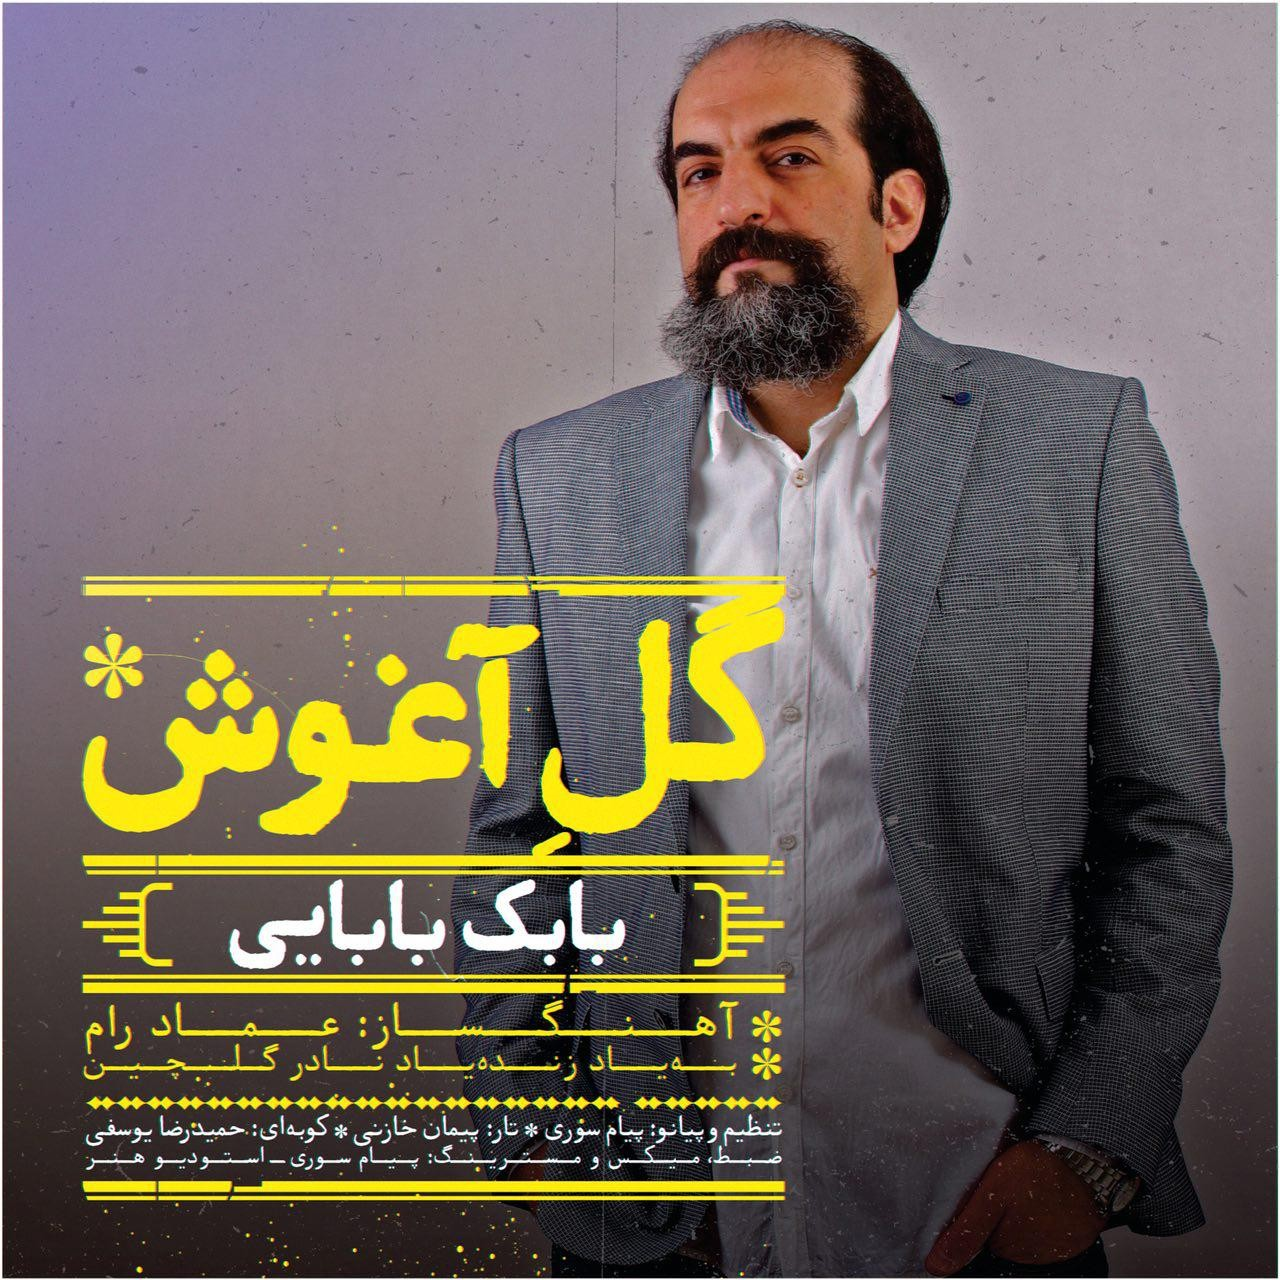 Babak Babaei – Gol e Aghoosh